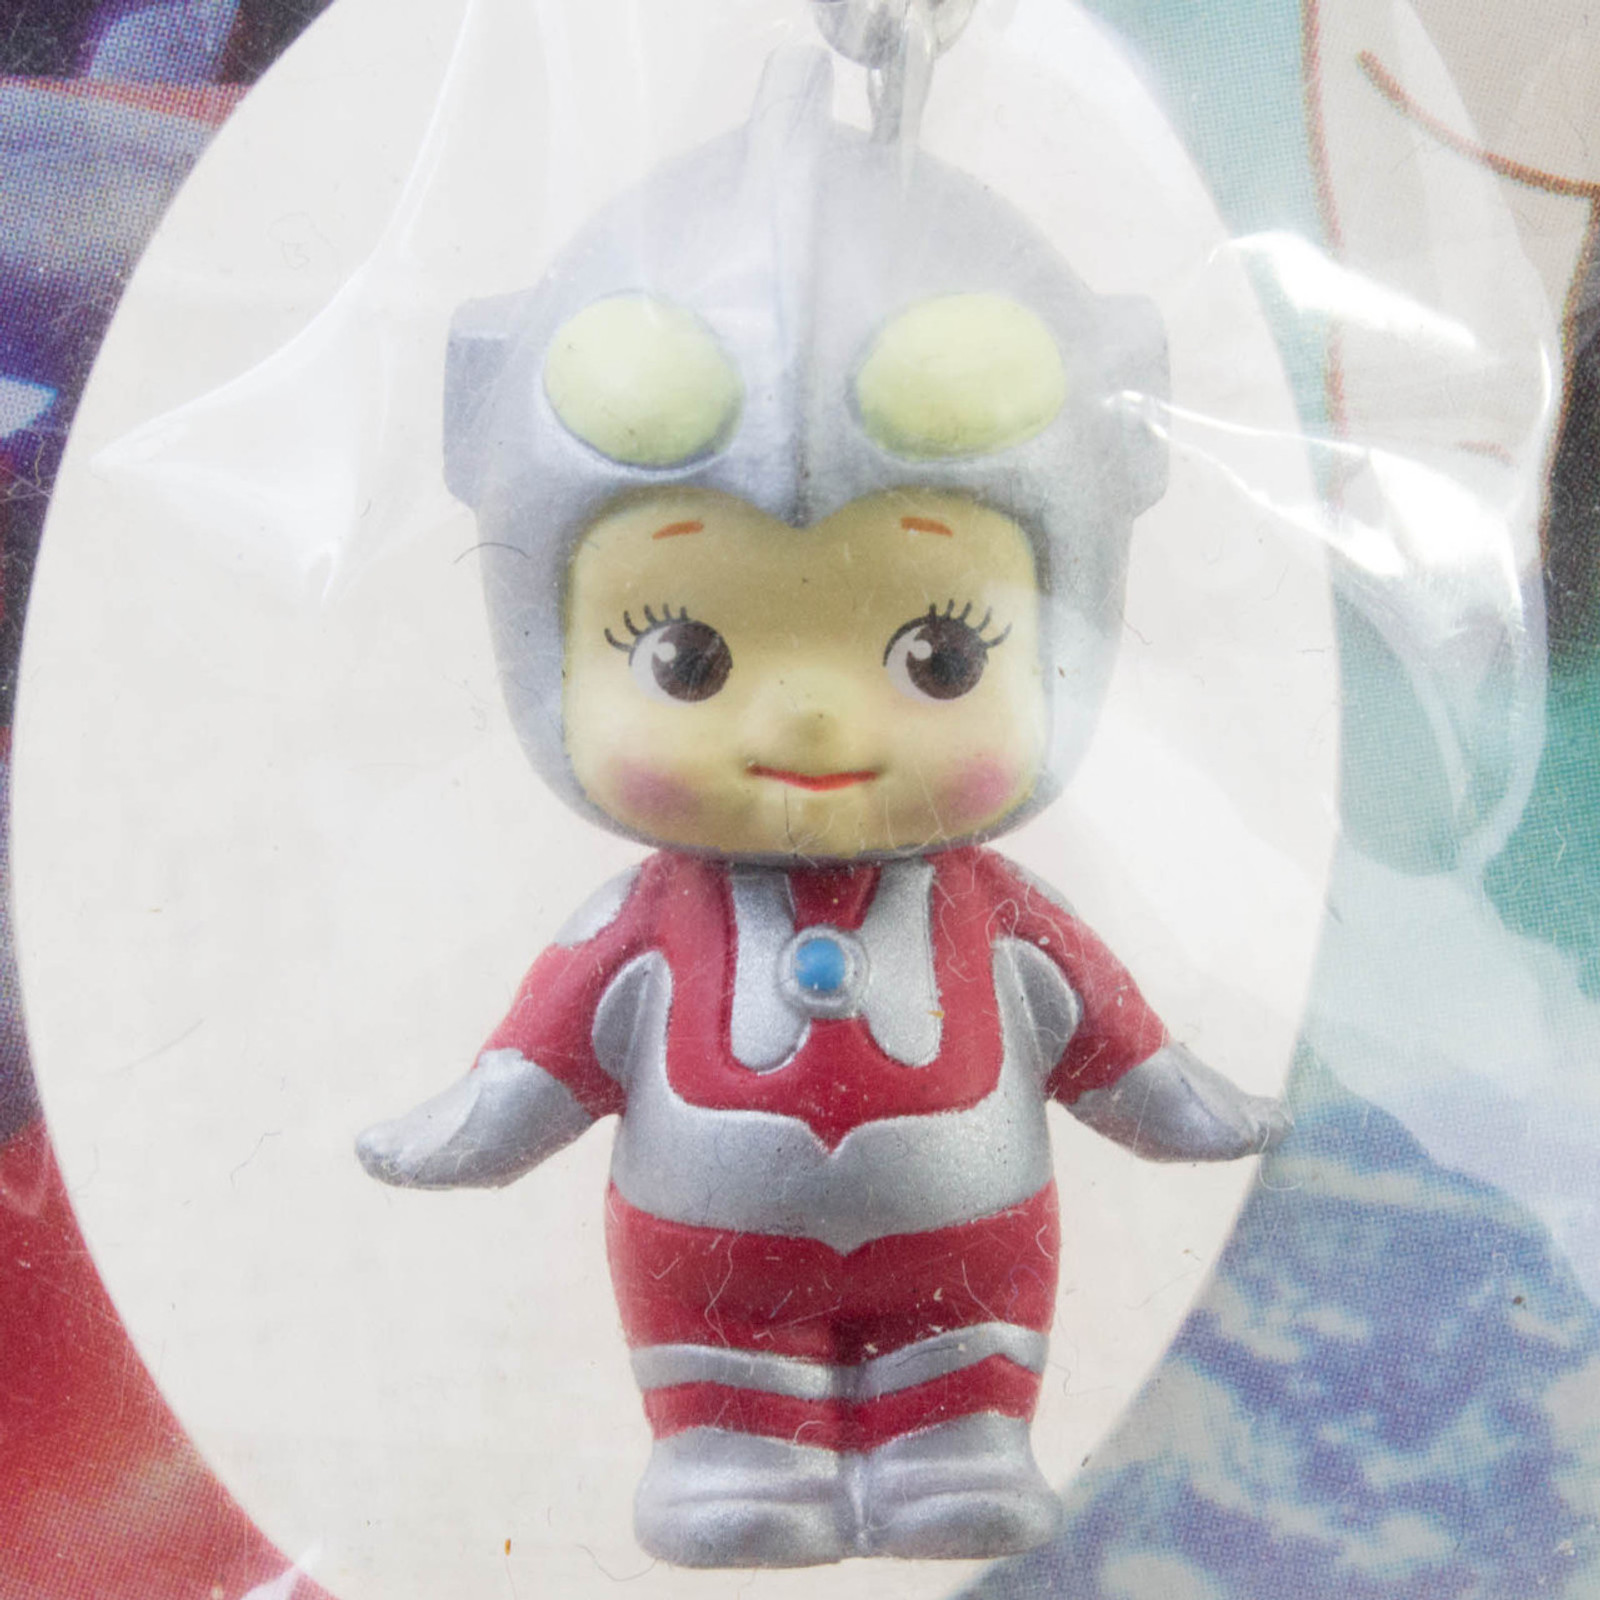 Ultraman Rose O'neill Kewpie Kewsion Figure Strap JAPAN ANIME